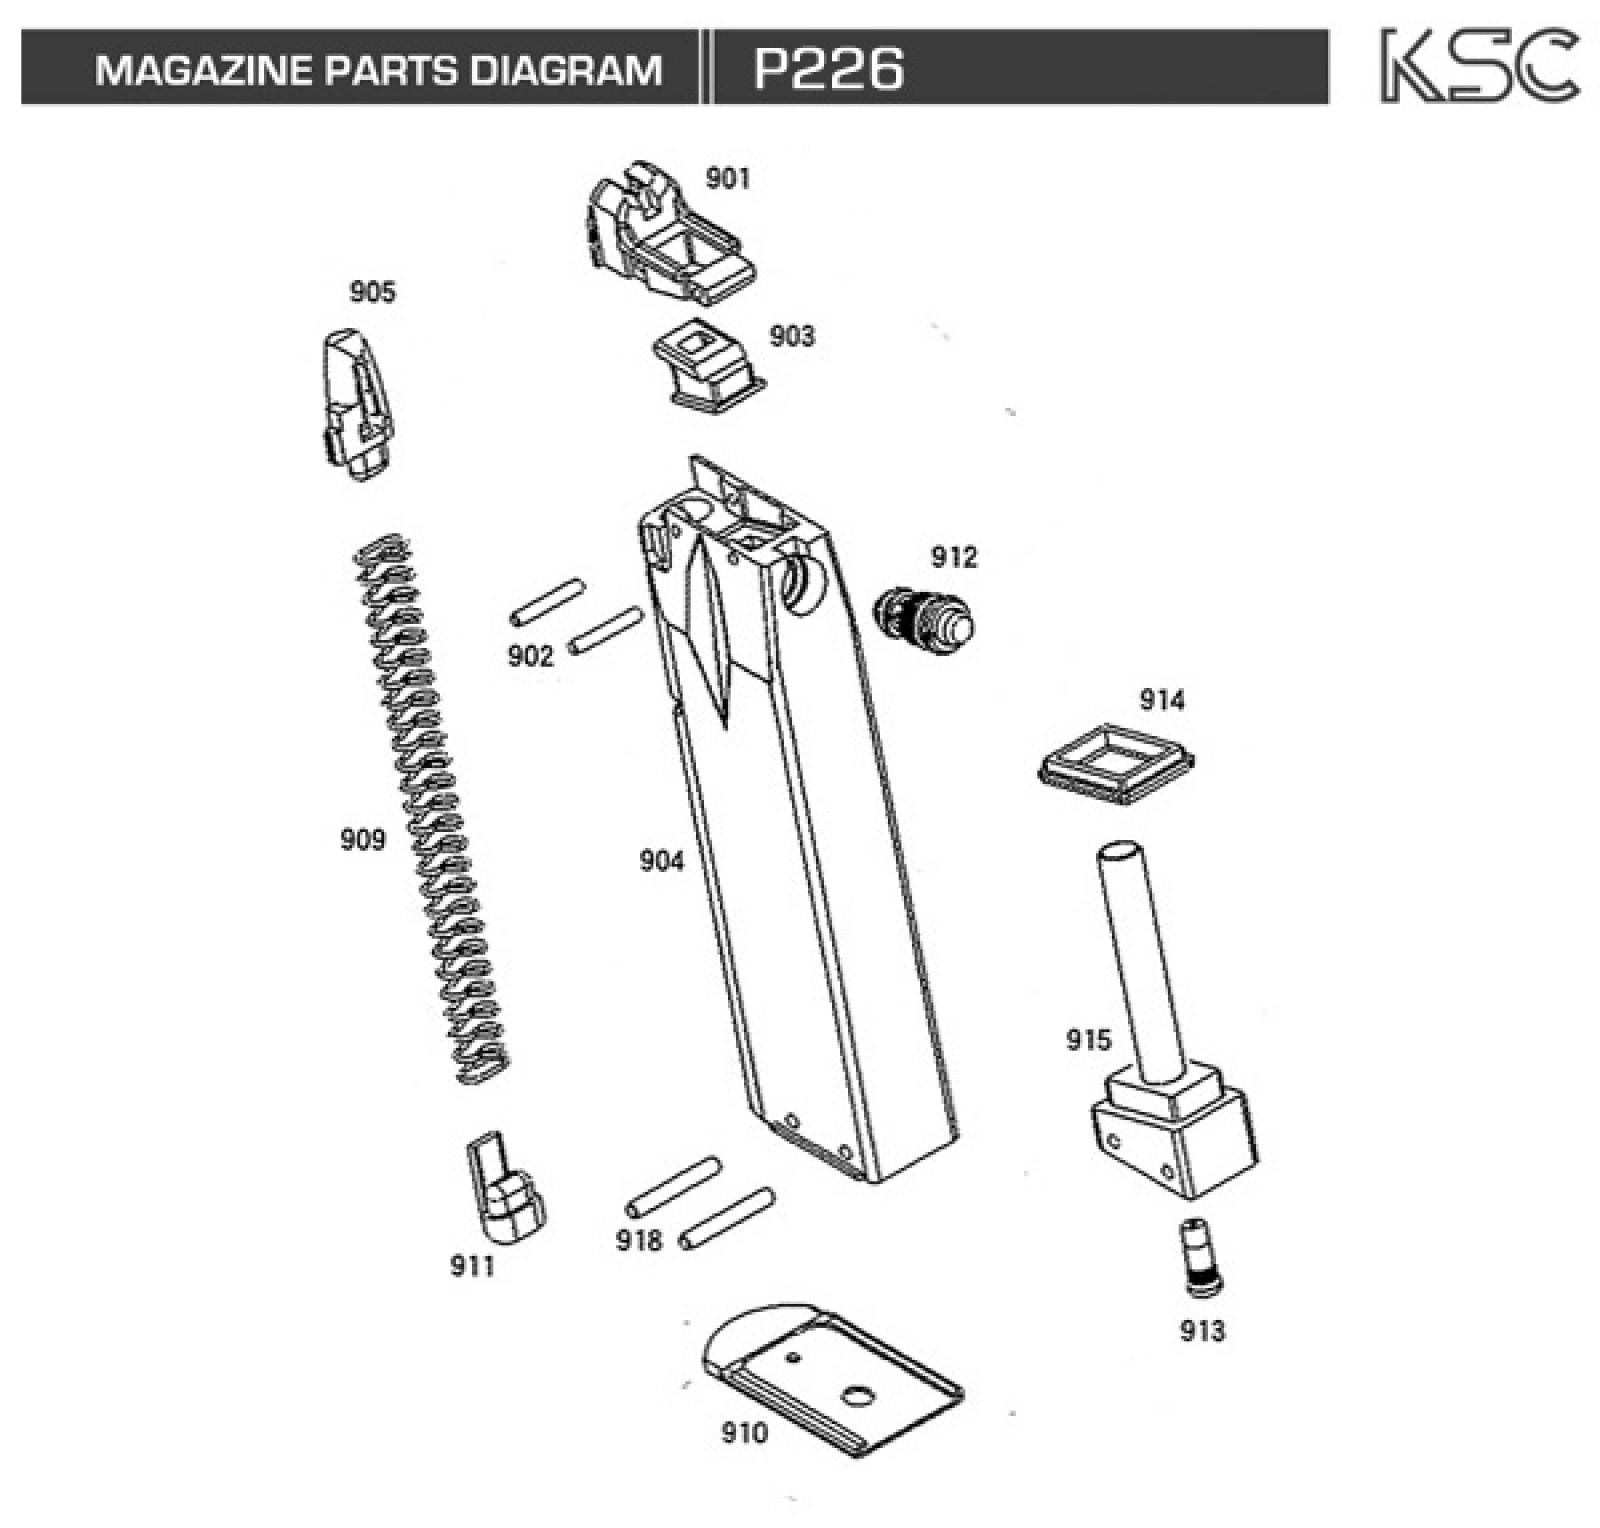 Exploded Diagram Ksc P226 Ksc Part Original Worldwide Shipping